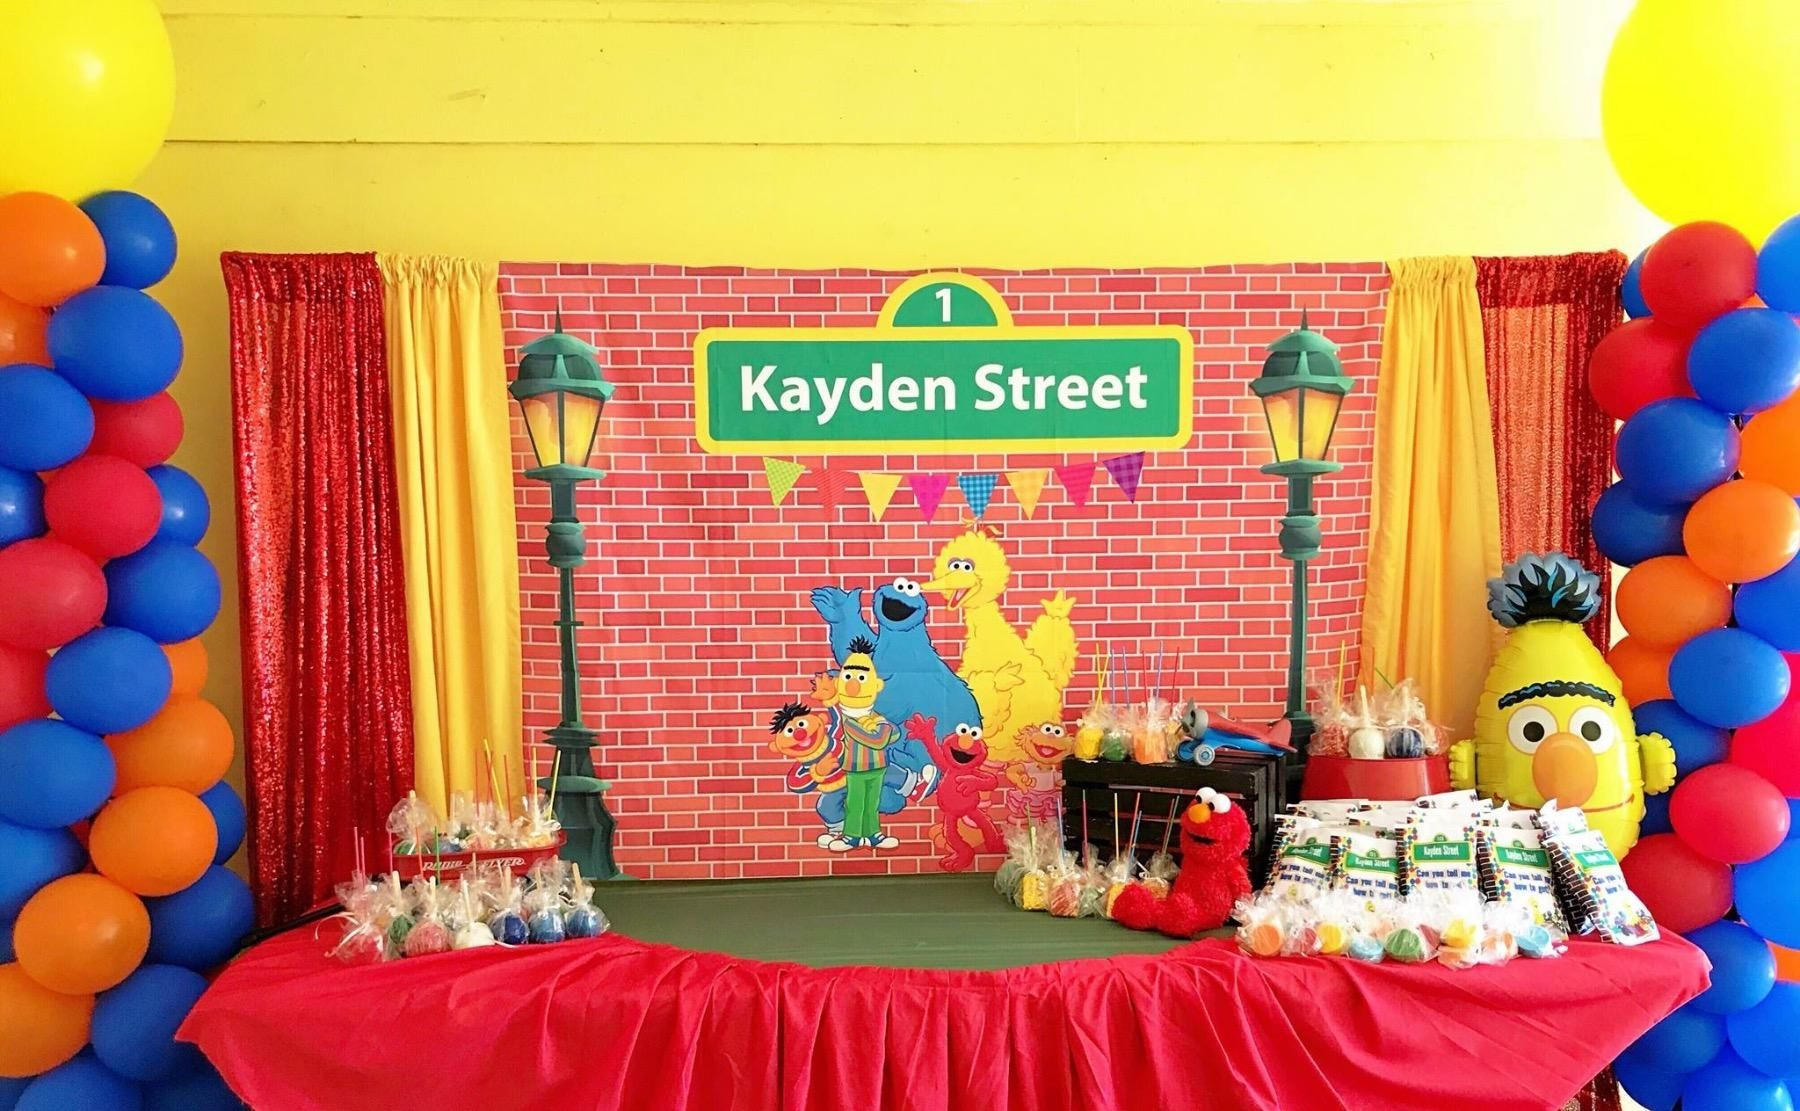 Allenjoy 7x5ft Customizable Sesame Street Theme Brick Wall Street Backdrop High Birthday Party Background Sesame Street Birthday Party Baby Shower Decorations